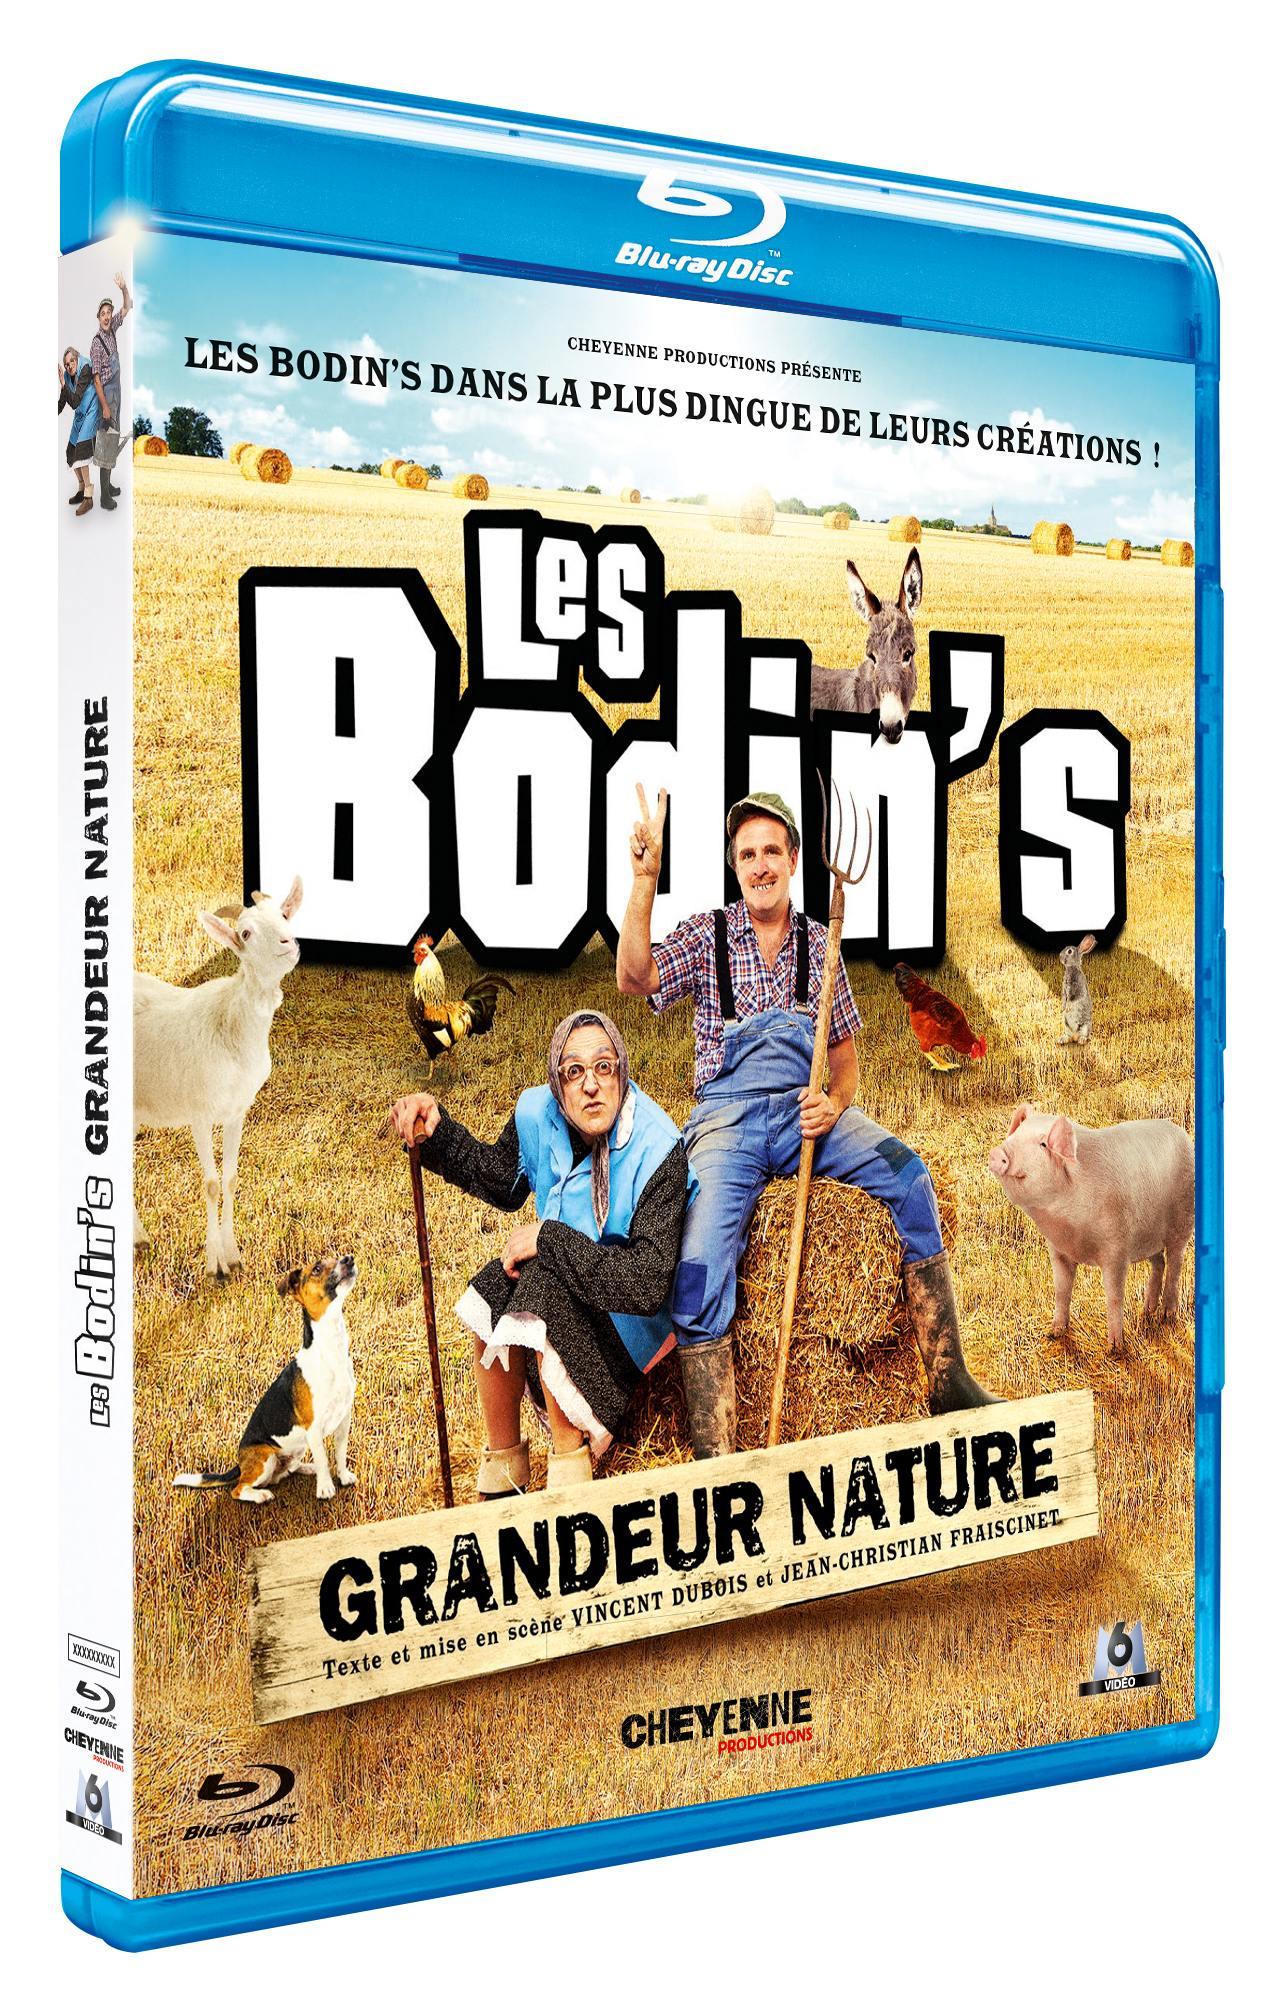 Les bodin's grandeur nature edition 2019 - blu-ray